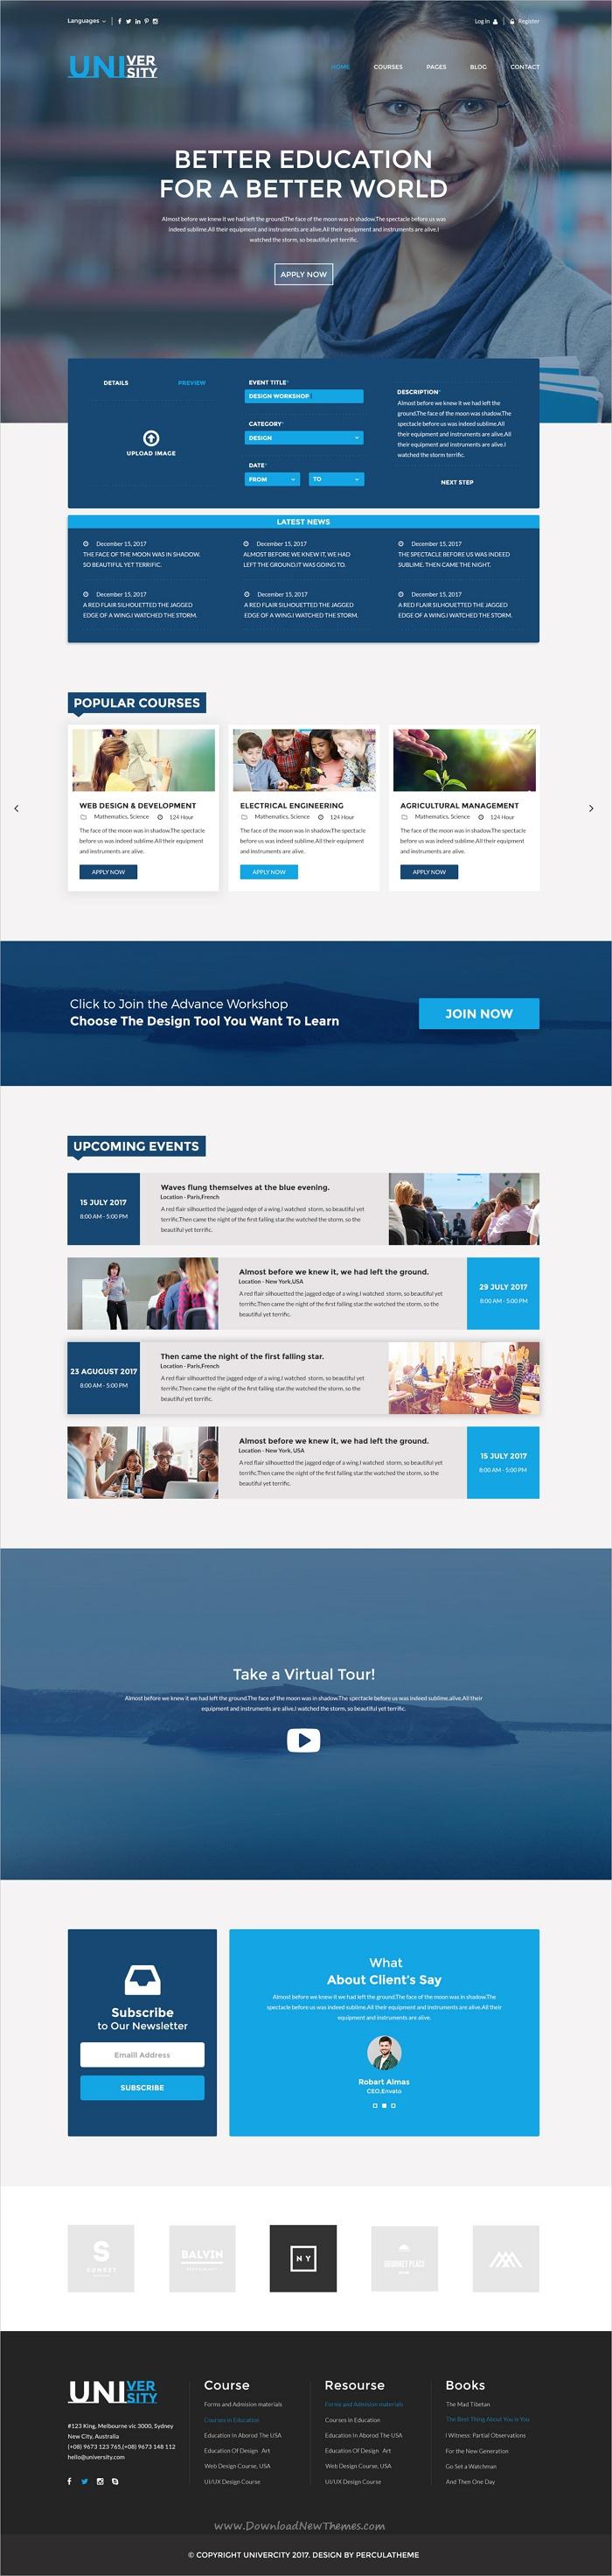 University Educational Psd Template Online Education Courses Online College Online Education